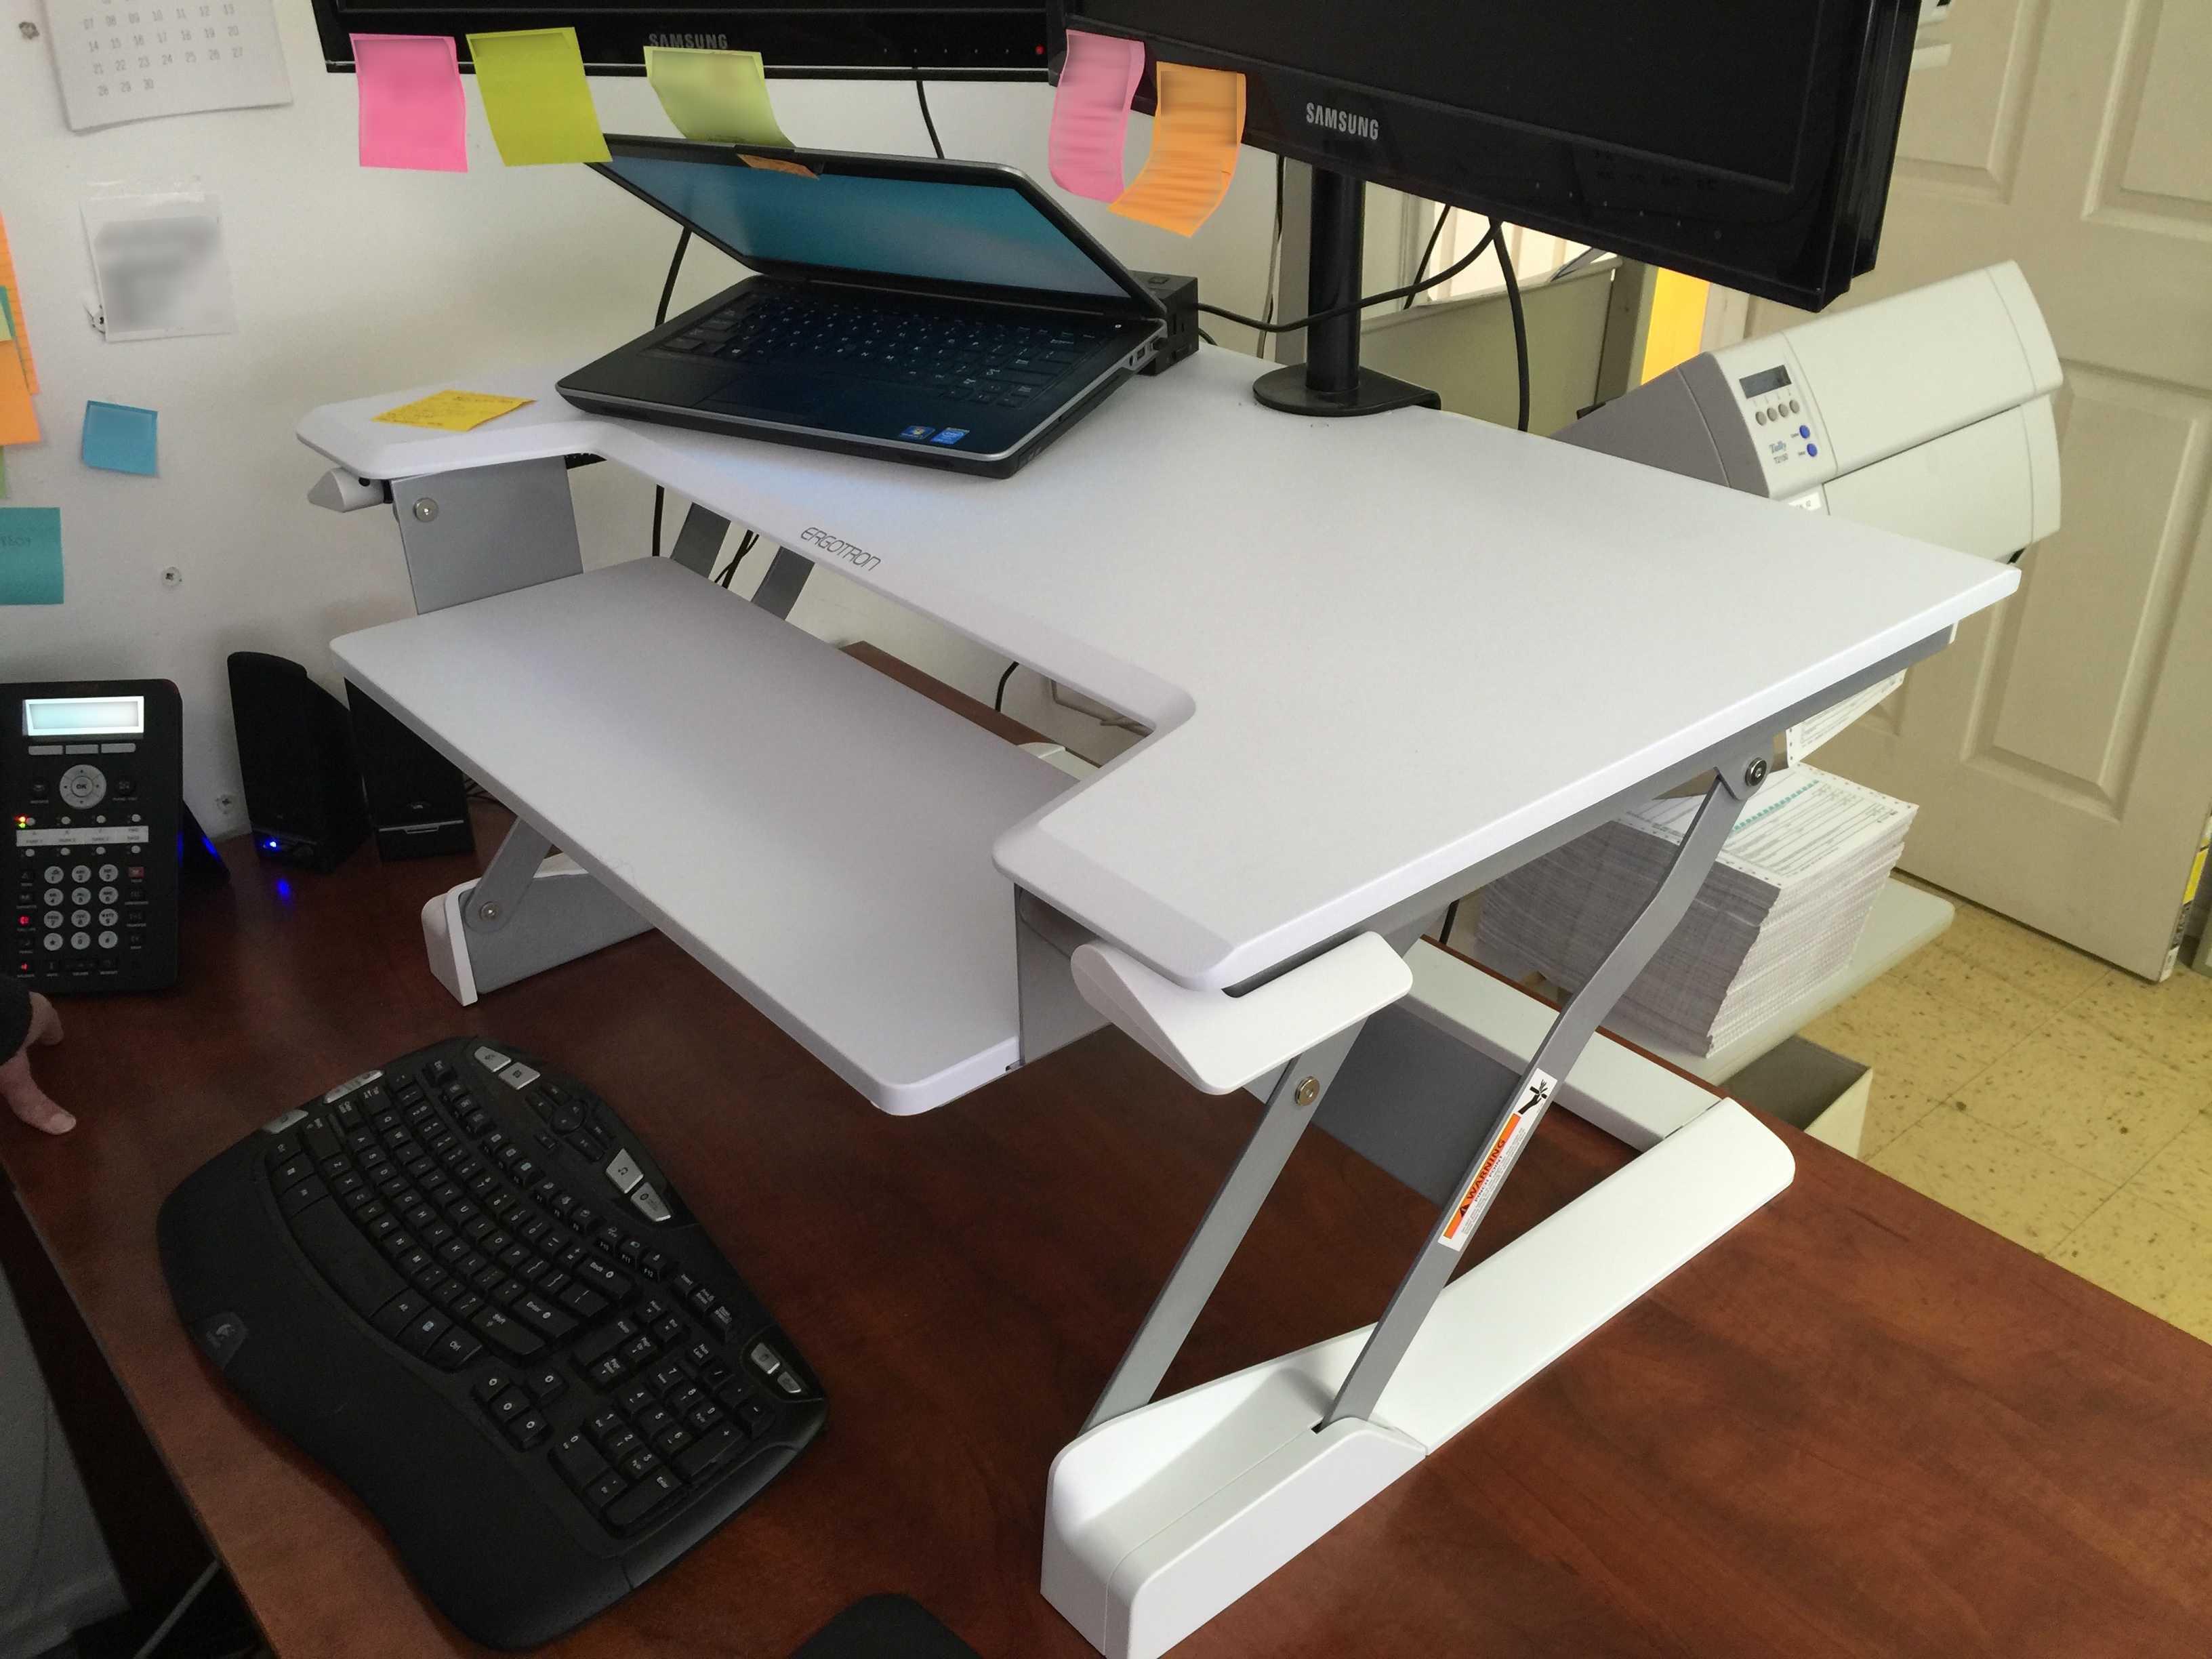 Varidesk review standing desks epic reviews - Varidesk Review Standing Desks Epic Reviews 32